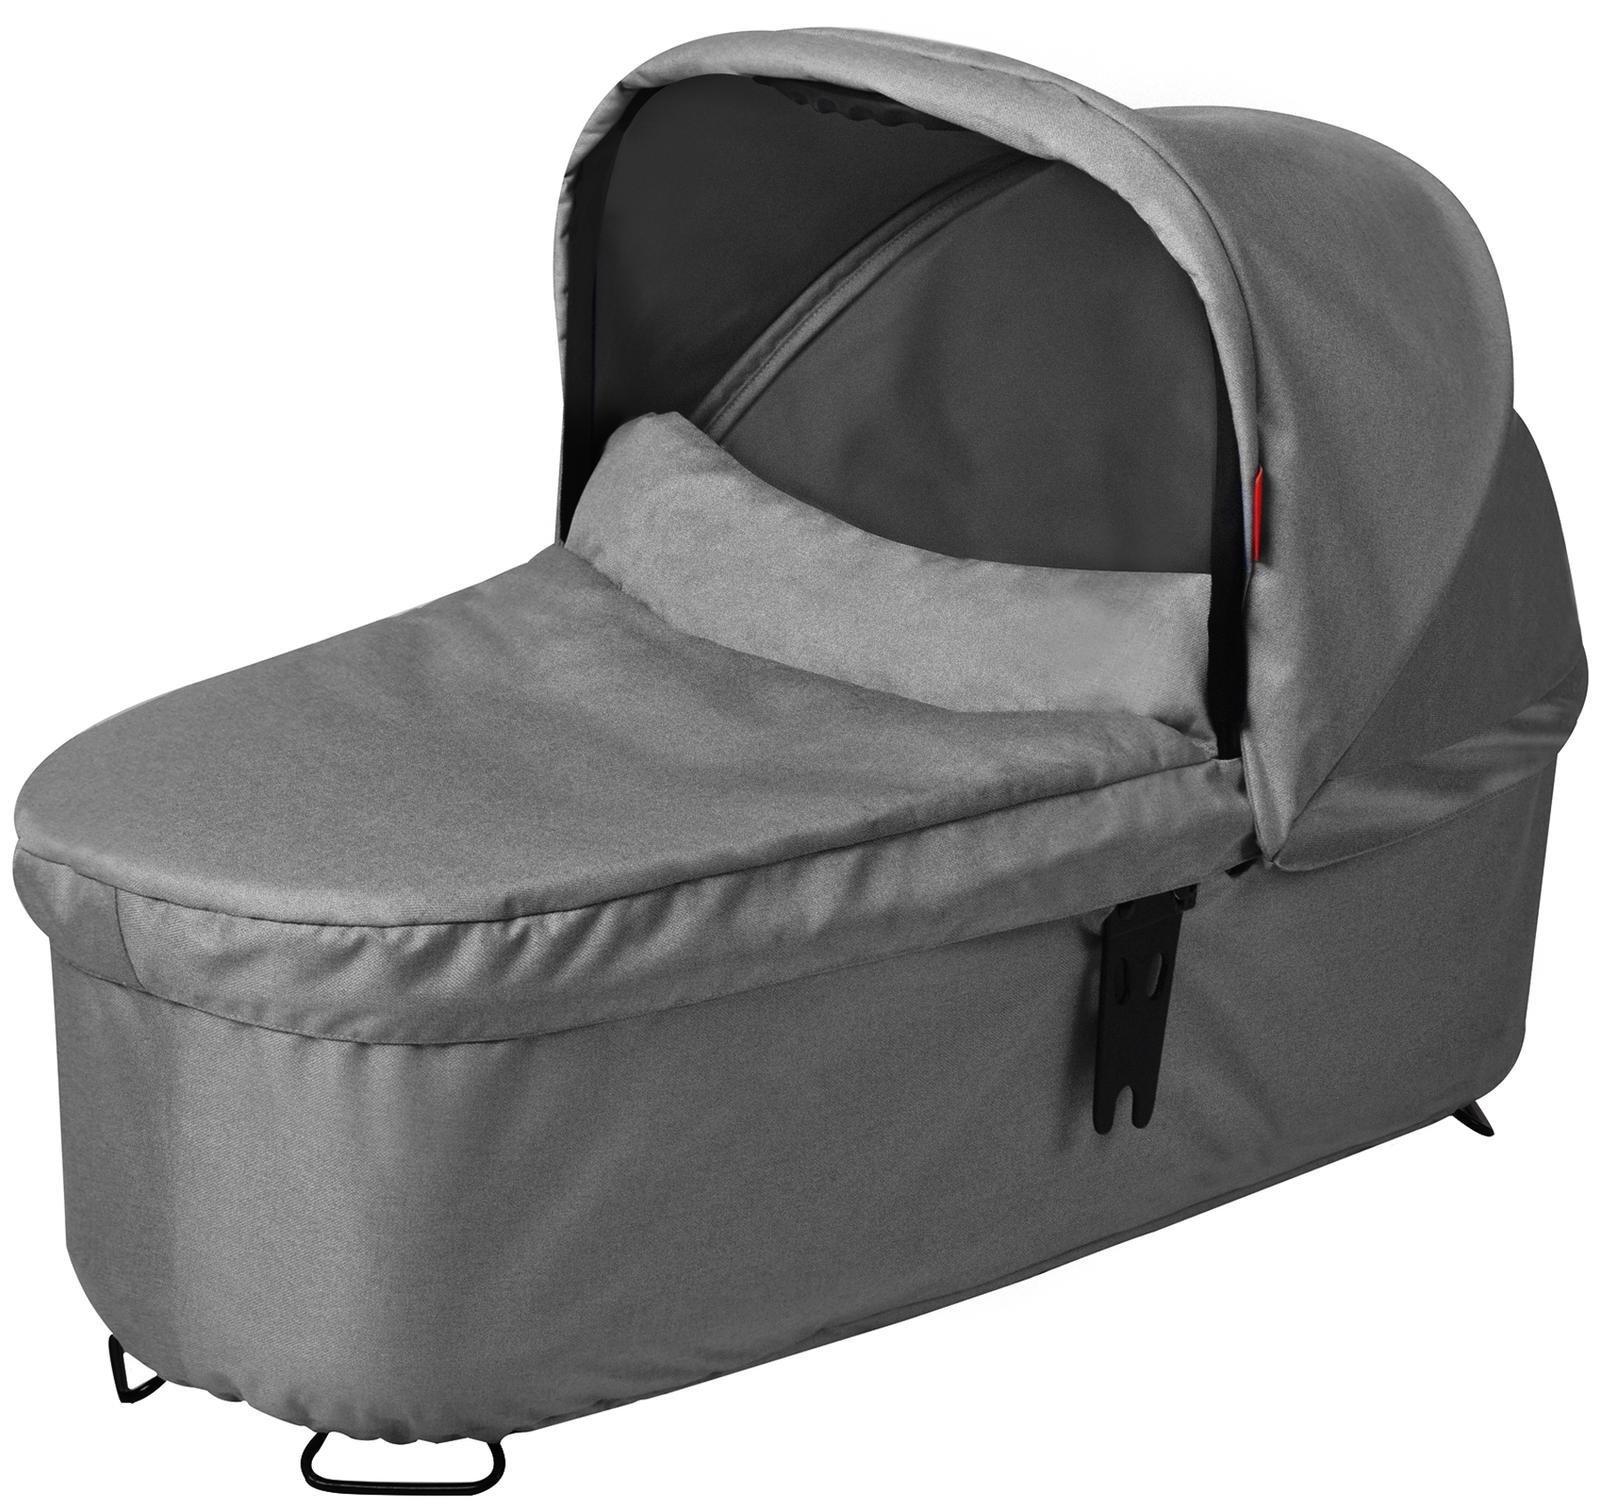 phil&teds Snug Carrycot for Dash Stroller, Grey Marl